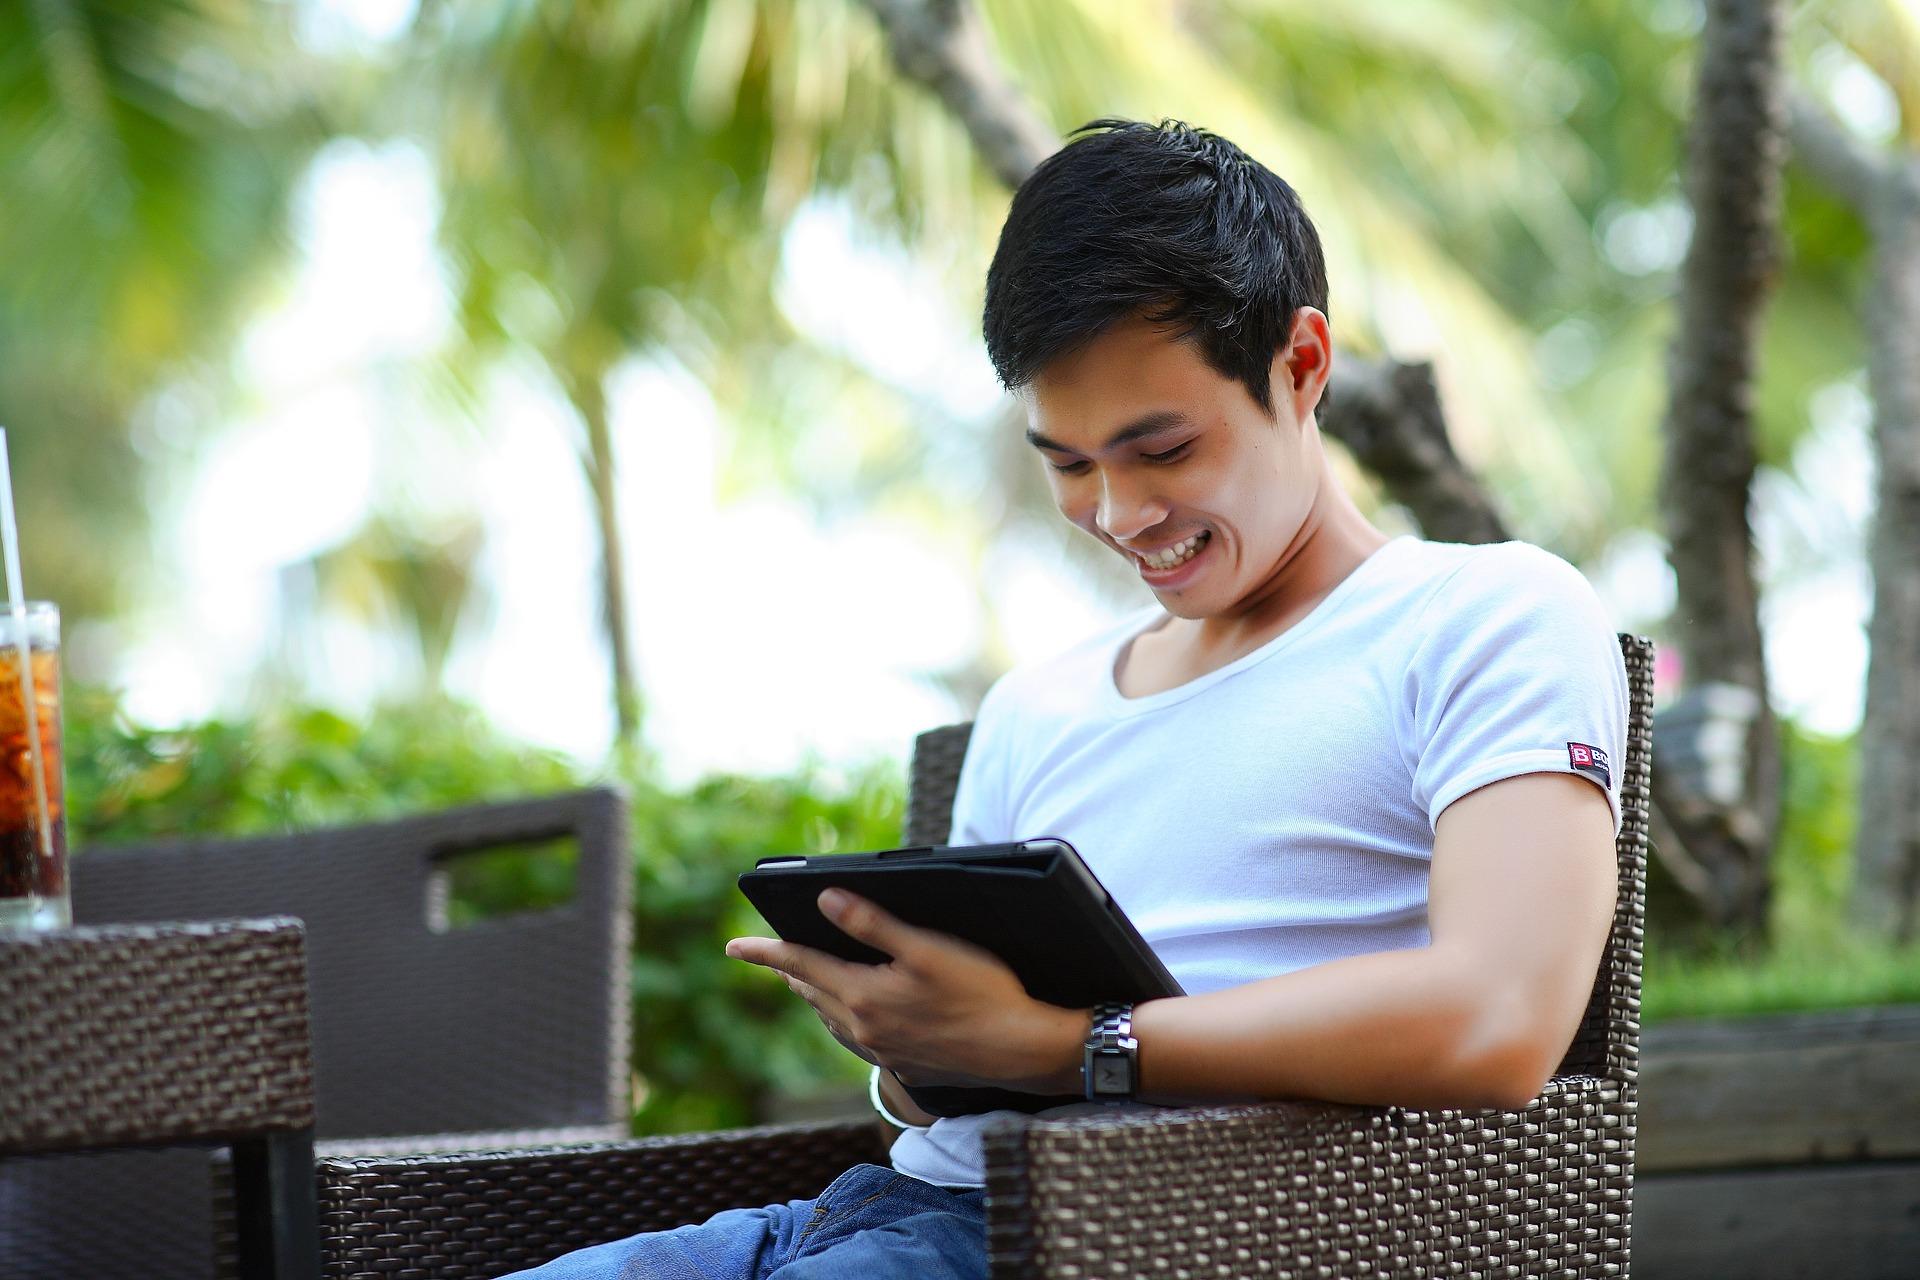 Photo of تعلم اللغة الانجليزية عبر هاتفك الذكي مع هذه التطبيقات